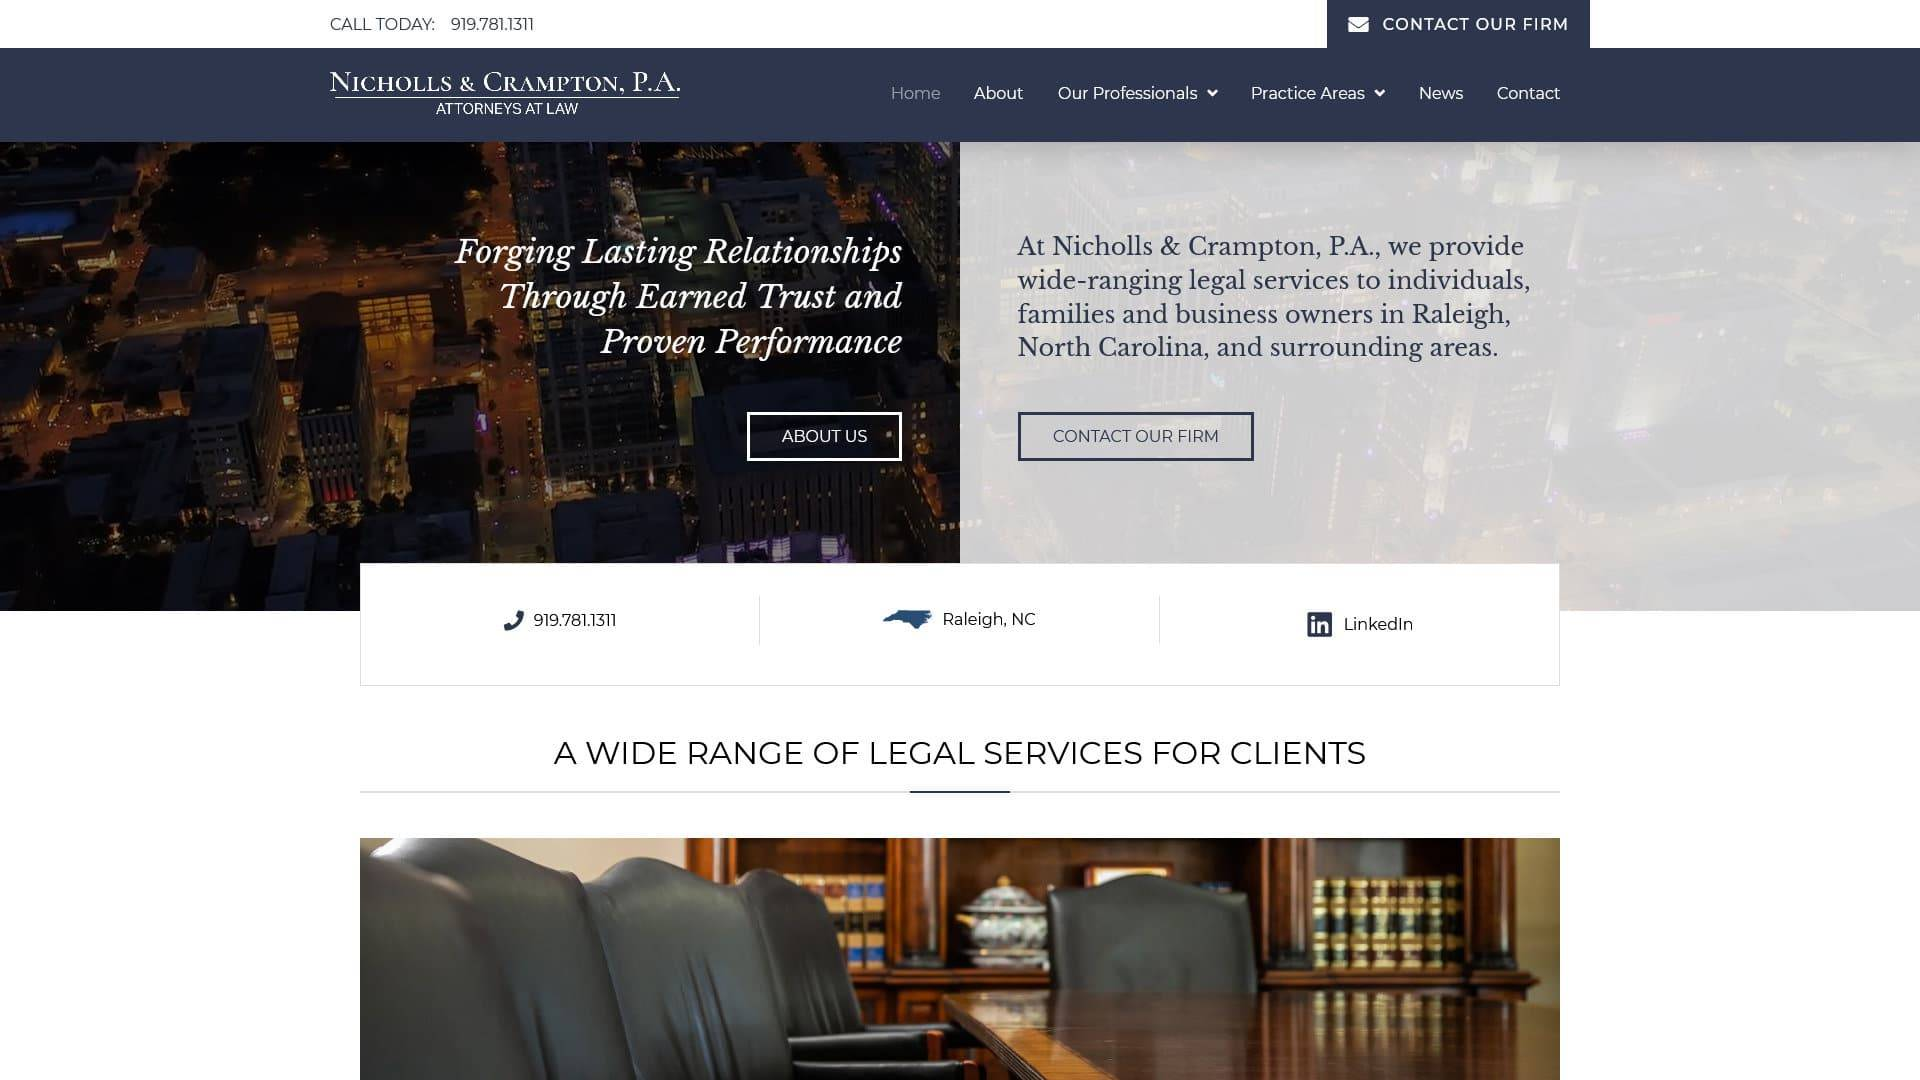 """Nicholls & Crampton Case Study"" Featured Image"